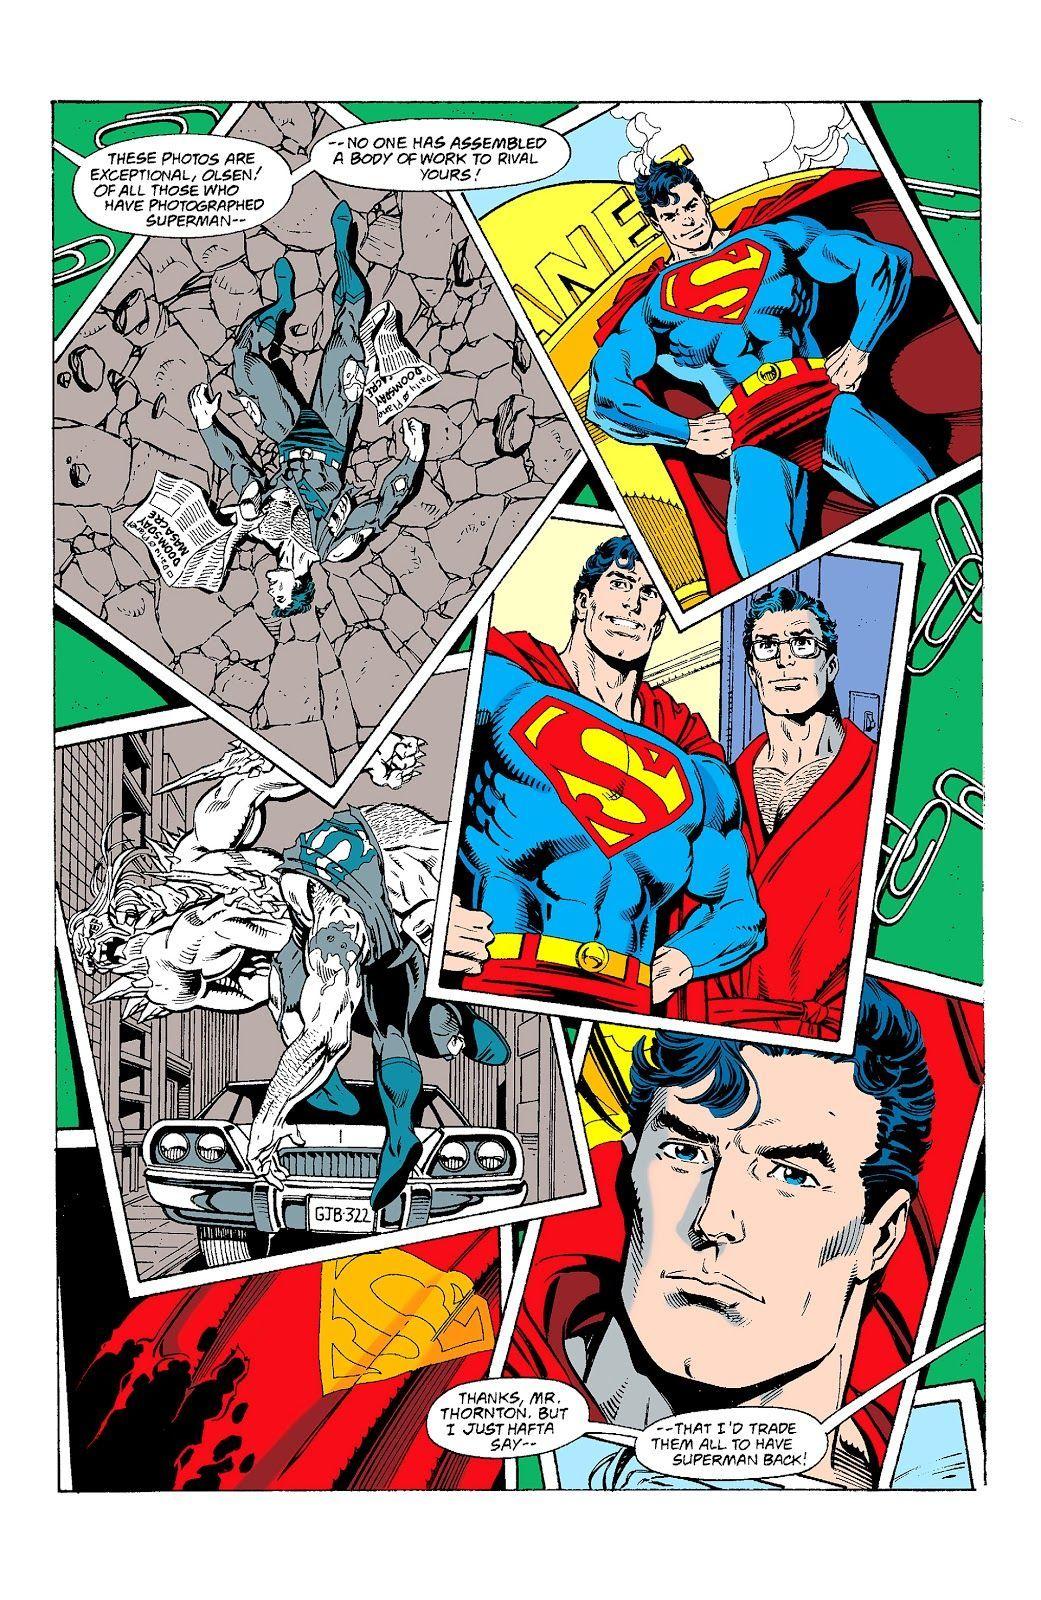 Superman #77 (Art and layout by Dan Jurgens, Finishing by Brett Breeding)